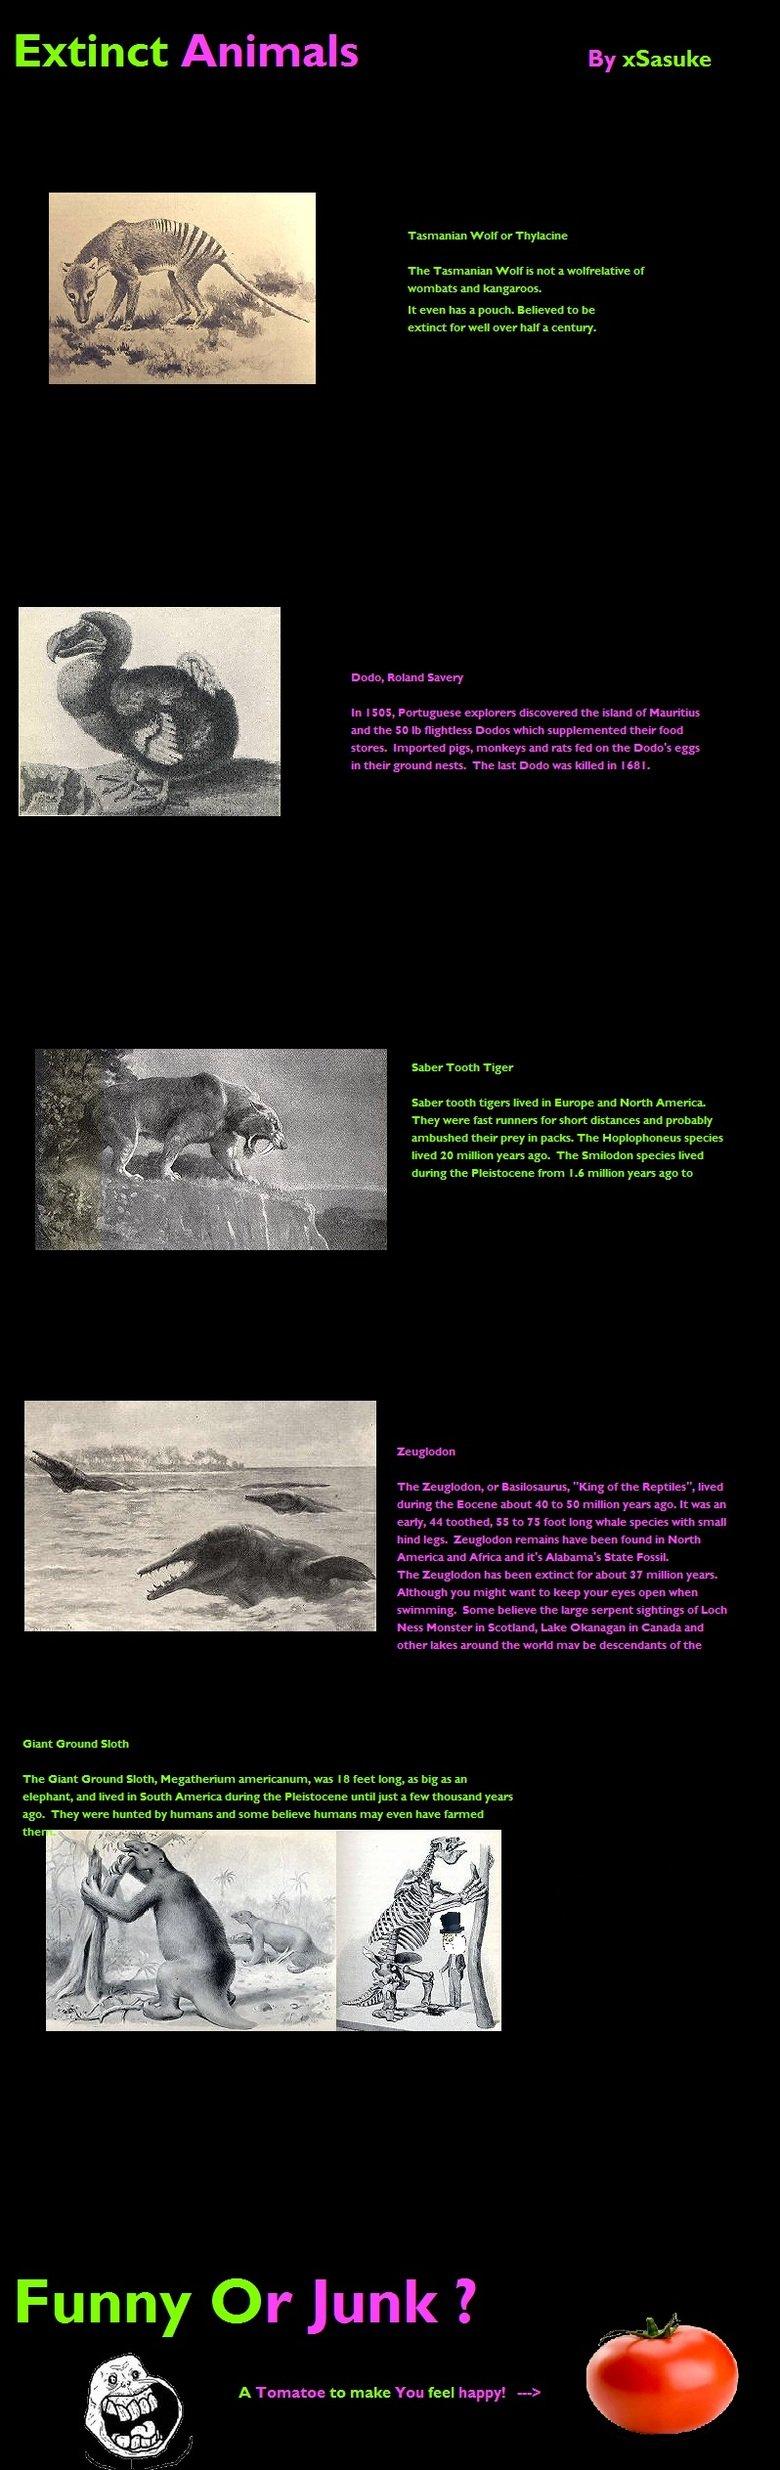 Extinct Animals! Part 1. A fact comp of extinct Animals! Just for you Funny Junk :3. Extinct Animals mermen Walros The 'Nam: nut ml vanhat: and kangaroo: extict